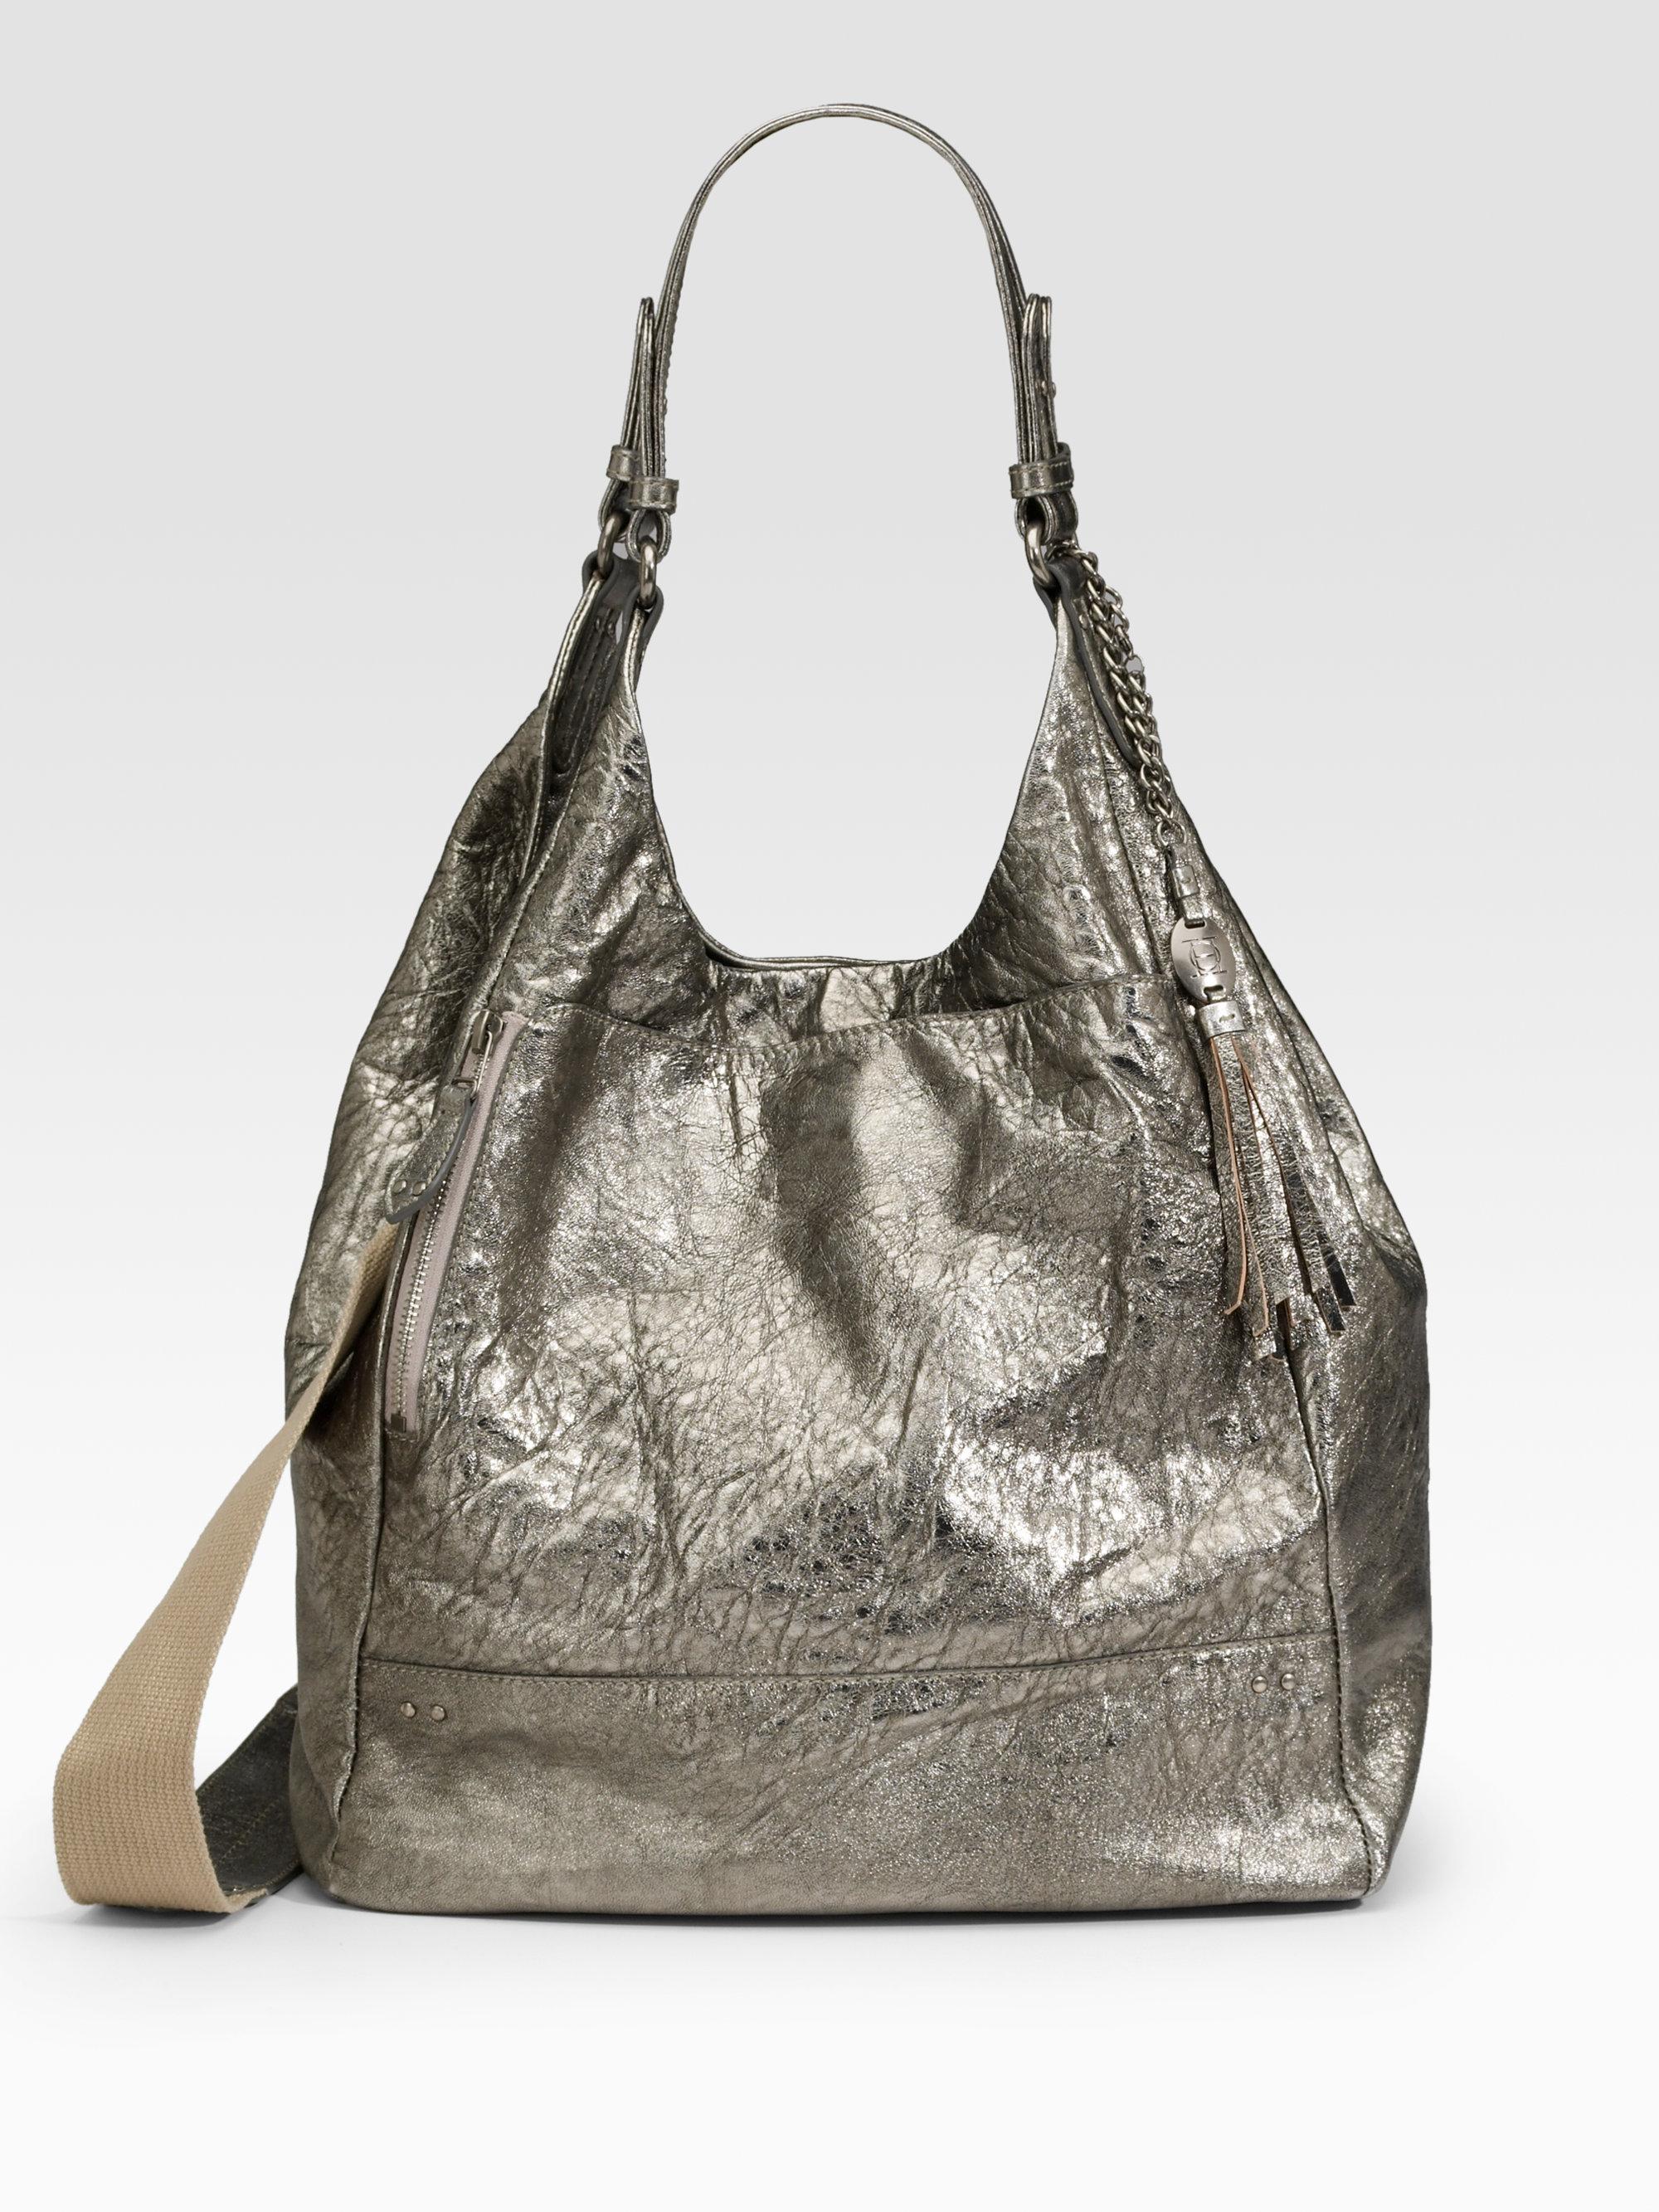 Olivia Harris Metallic Lambskin Shoulder Bag In Silver